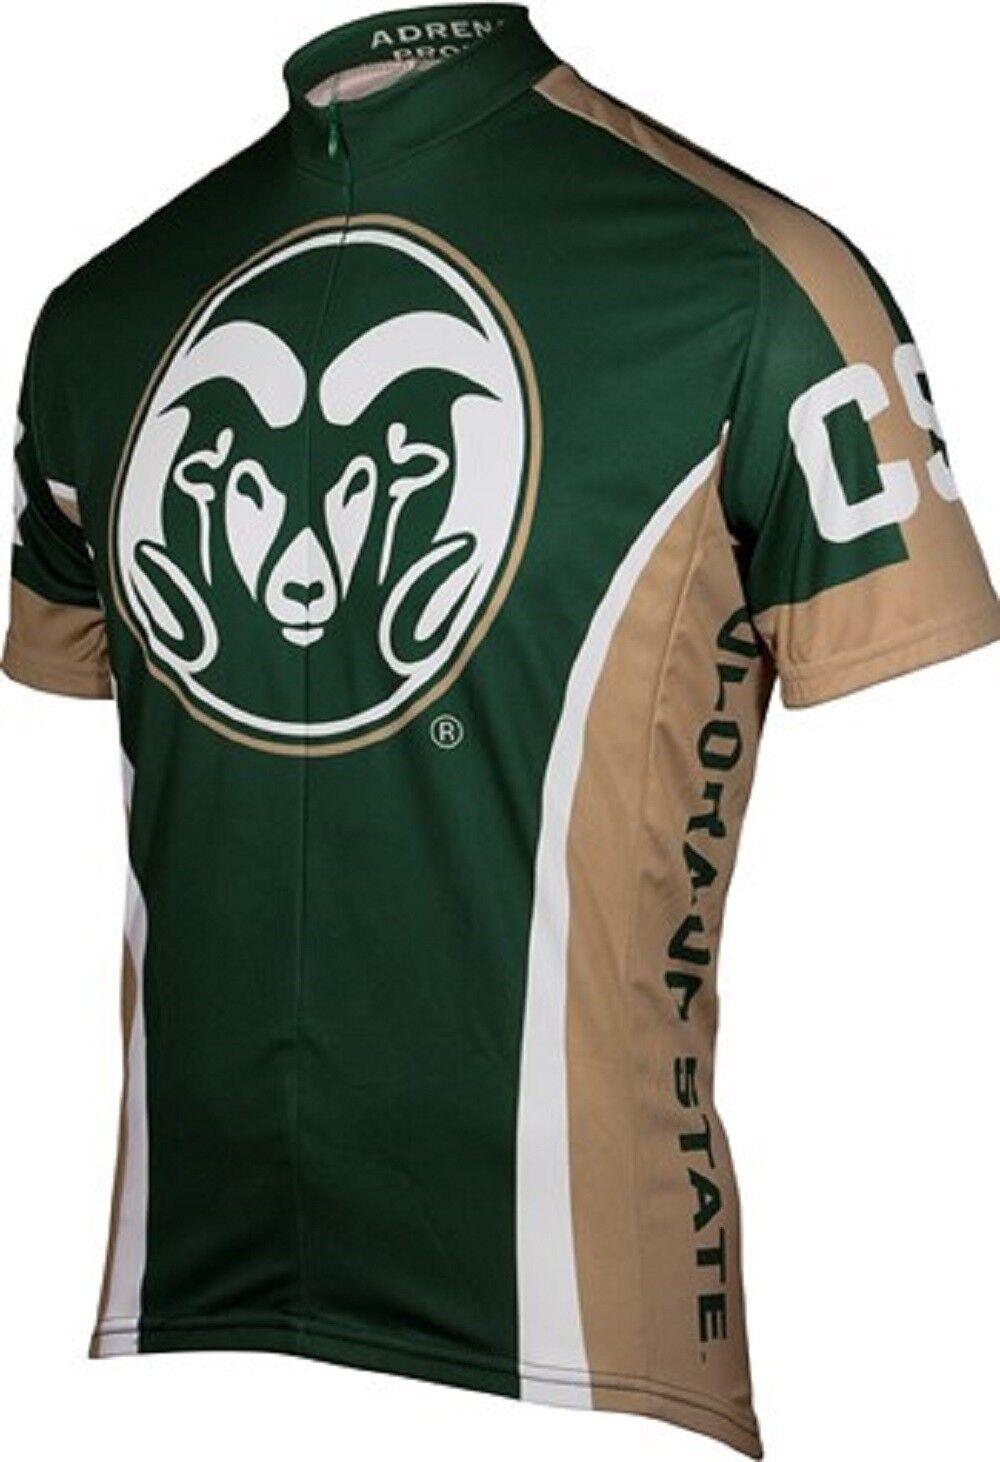 NCAA Sie's Adrenaline Promotions Farbeado State University Radfahren Jersey